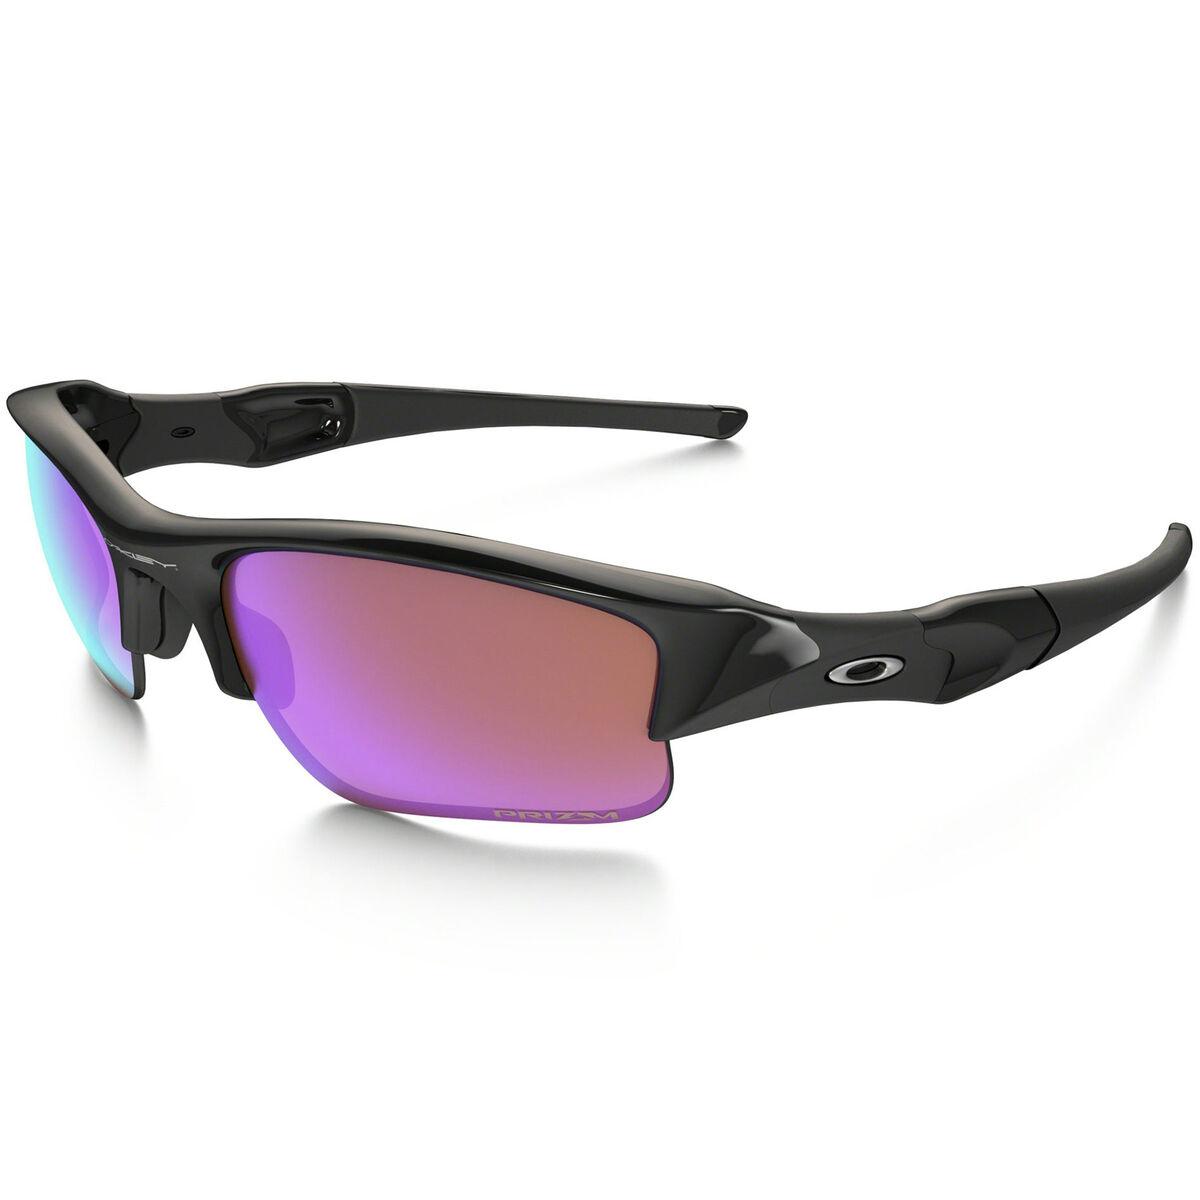 90e5966534be6 Oakley PRIZM Golf Flak Jacket Sunglasses